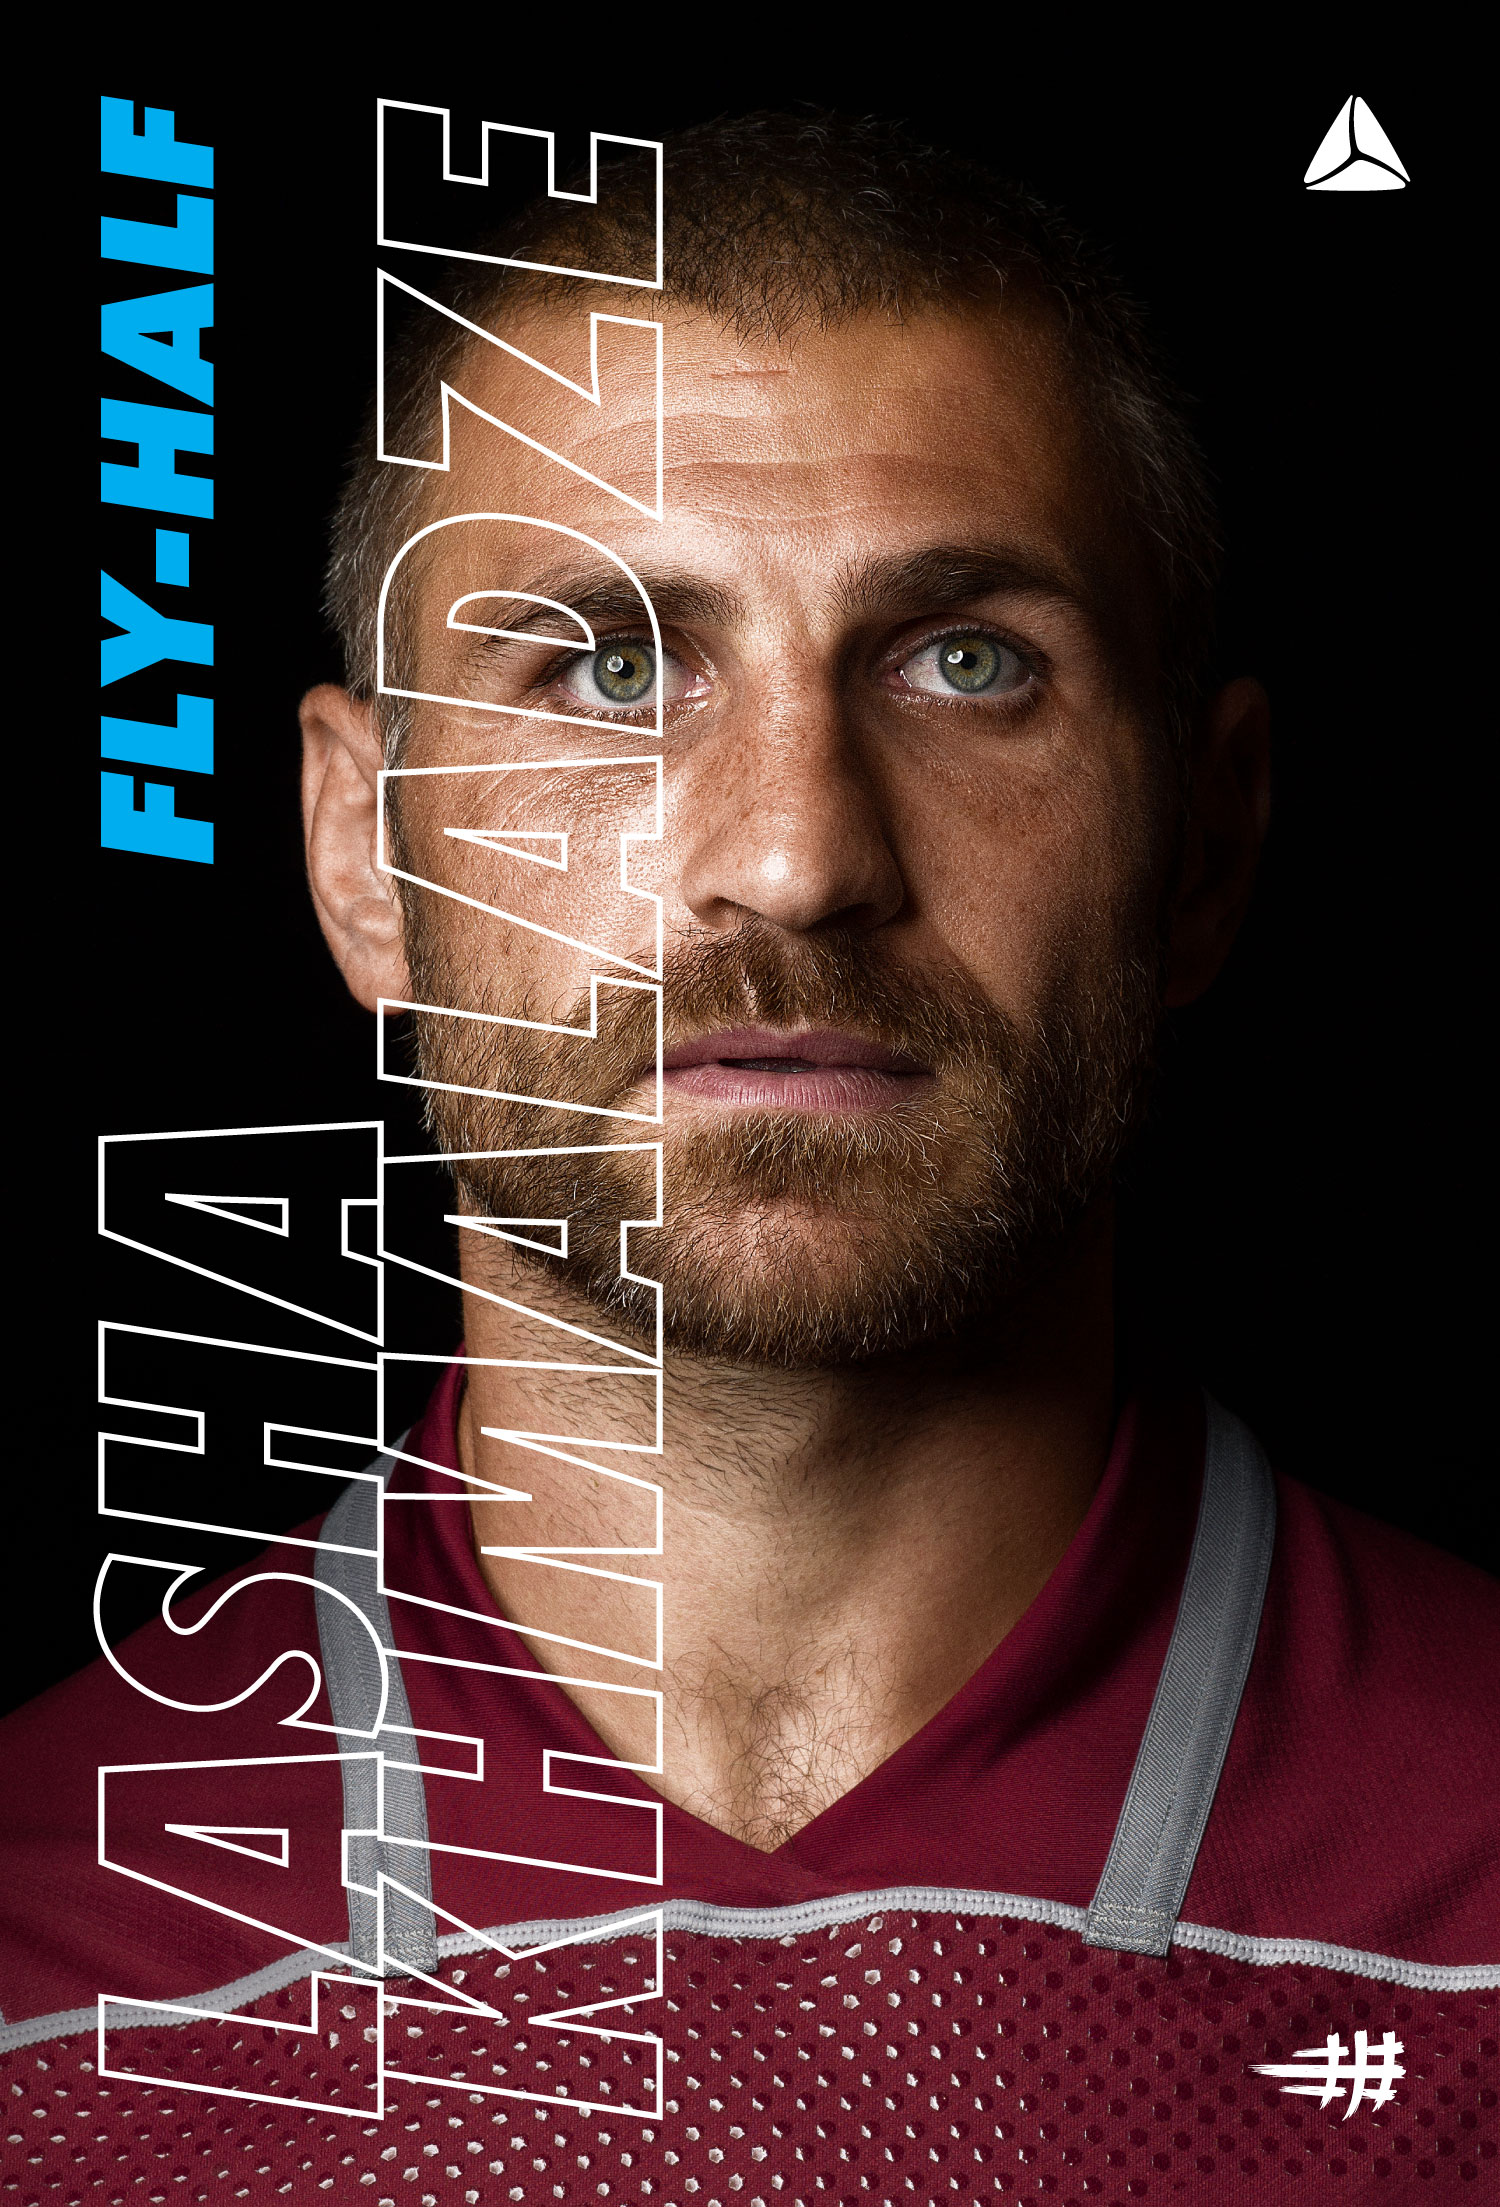 Poster-Khmaladze-w1500-q60-01